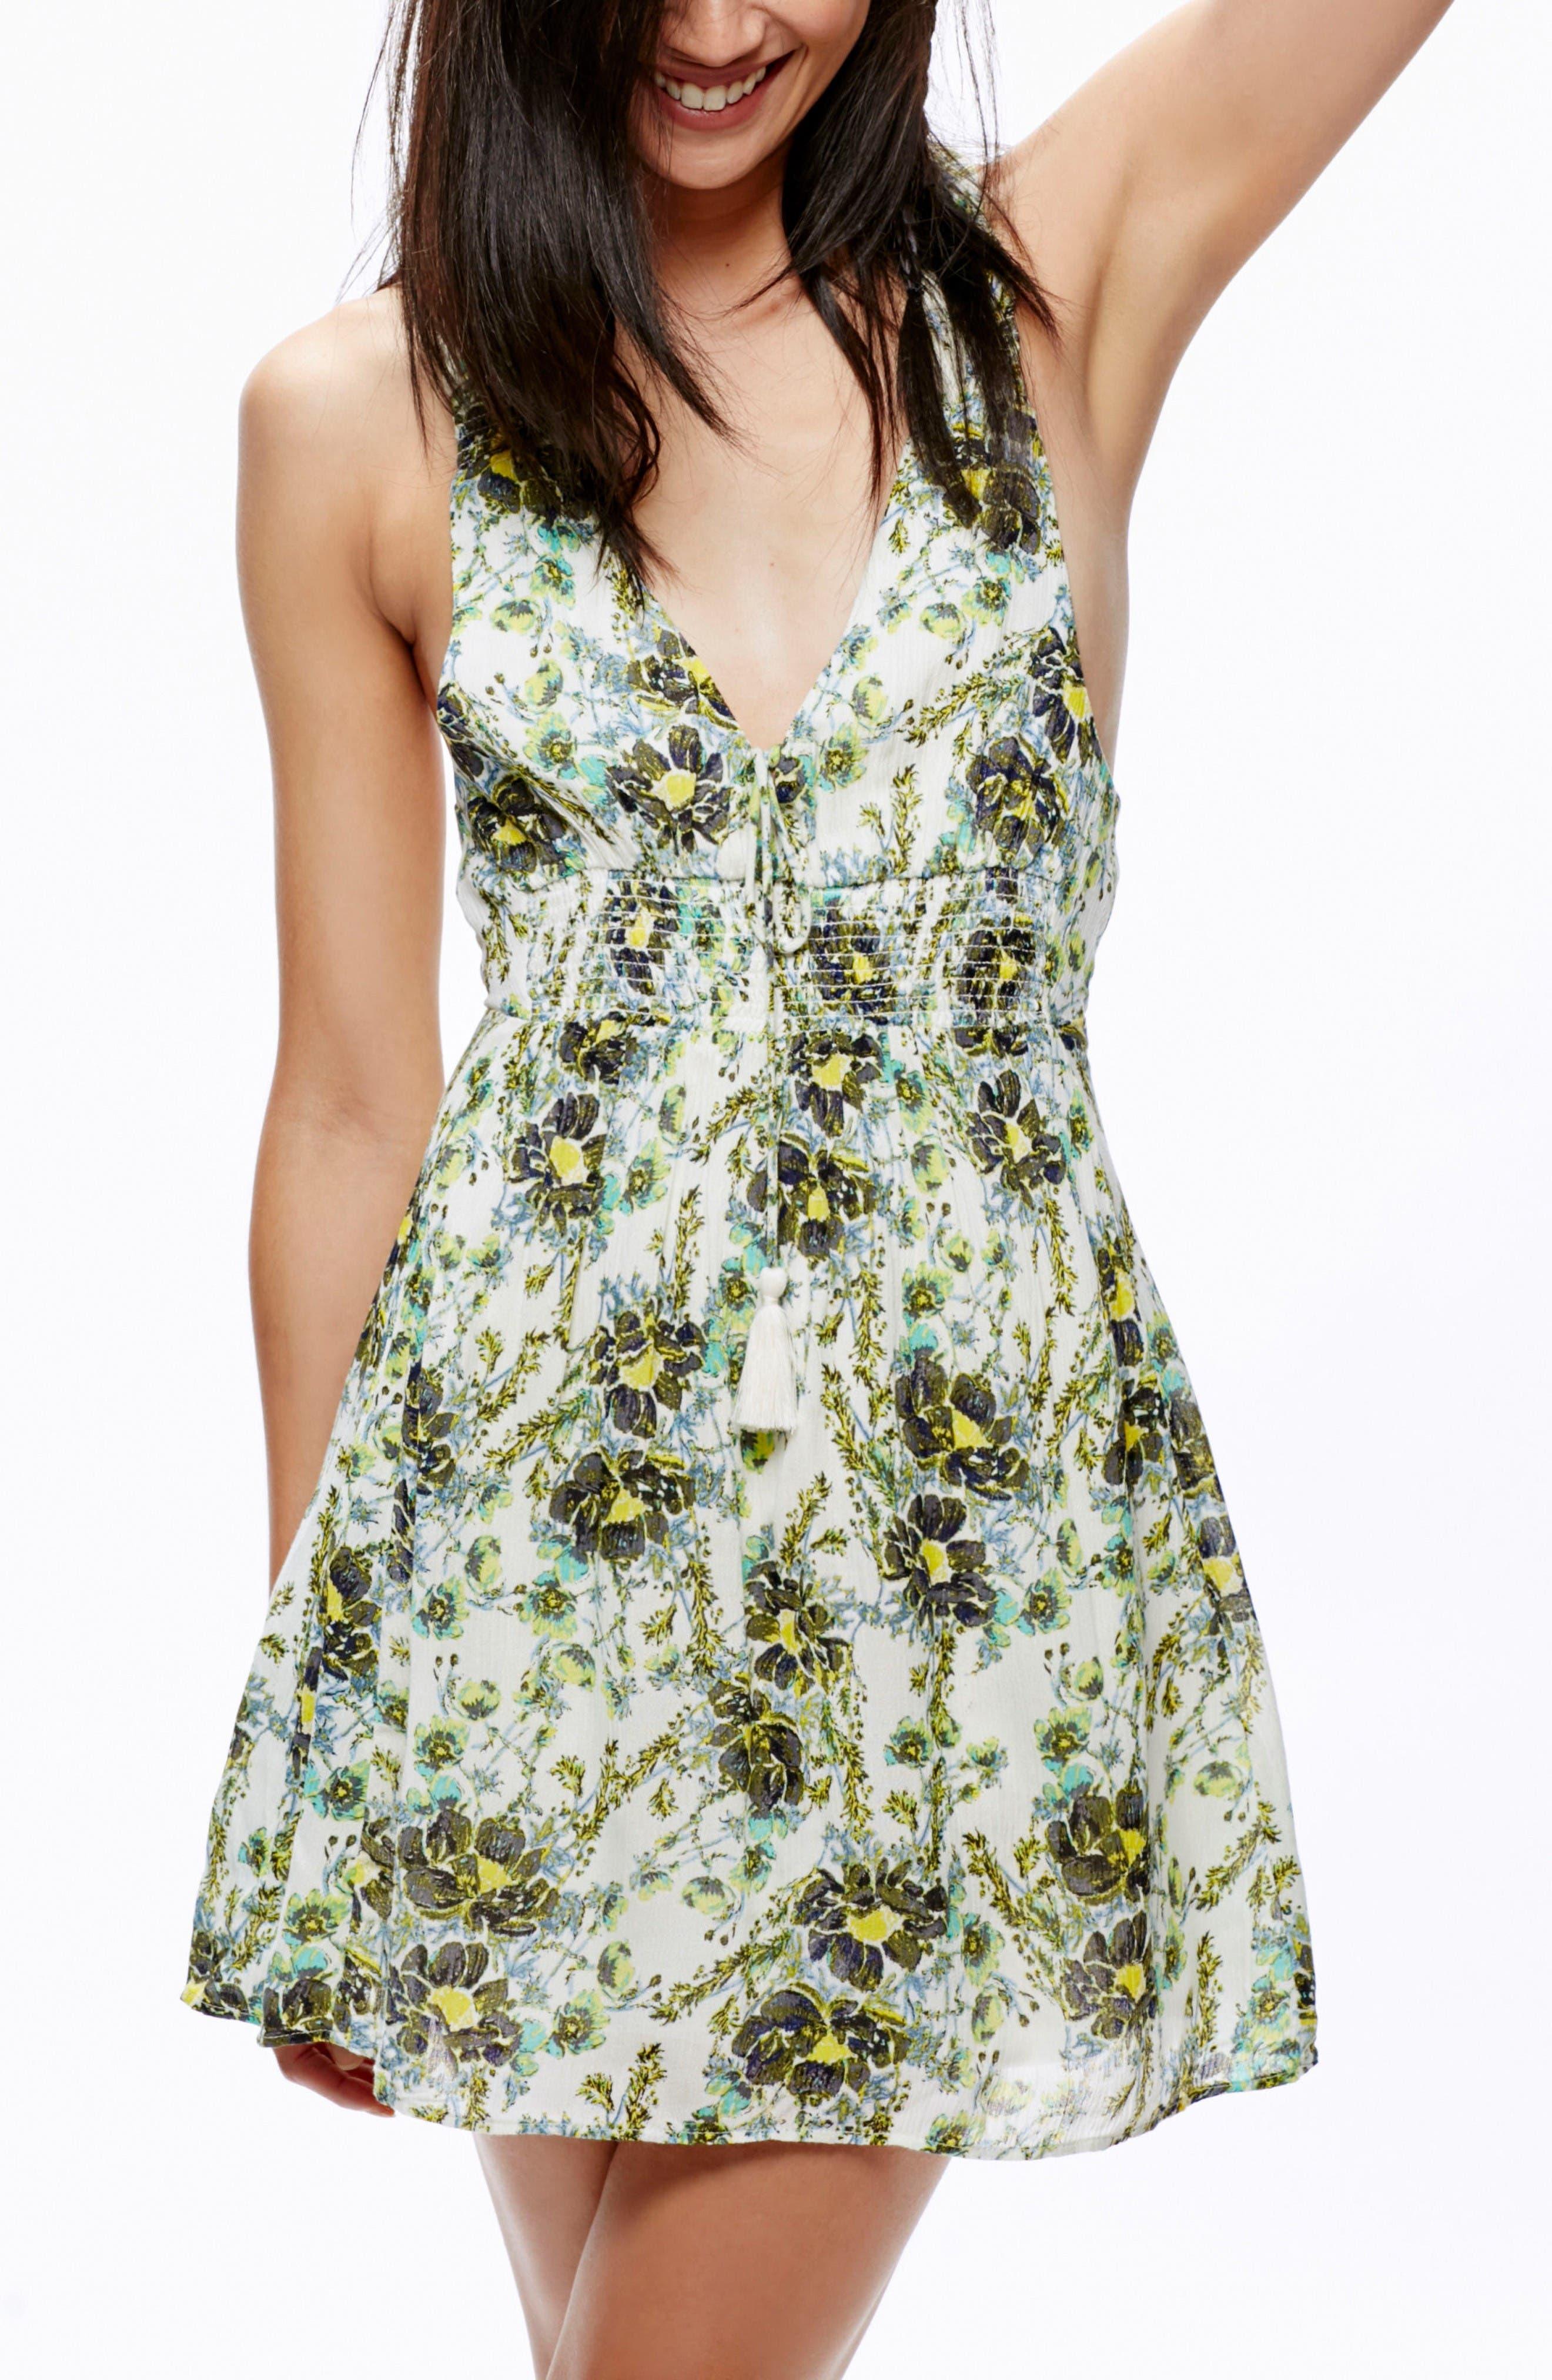 Alternate Image 1 Selected - Free People Floral Print Minidress